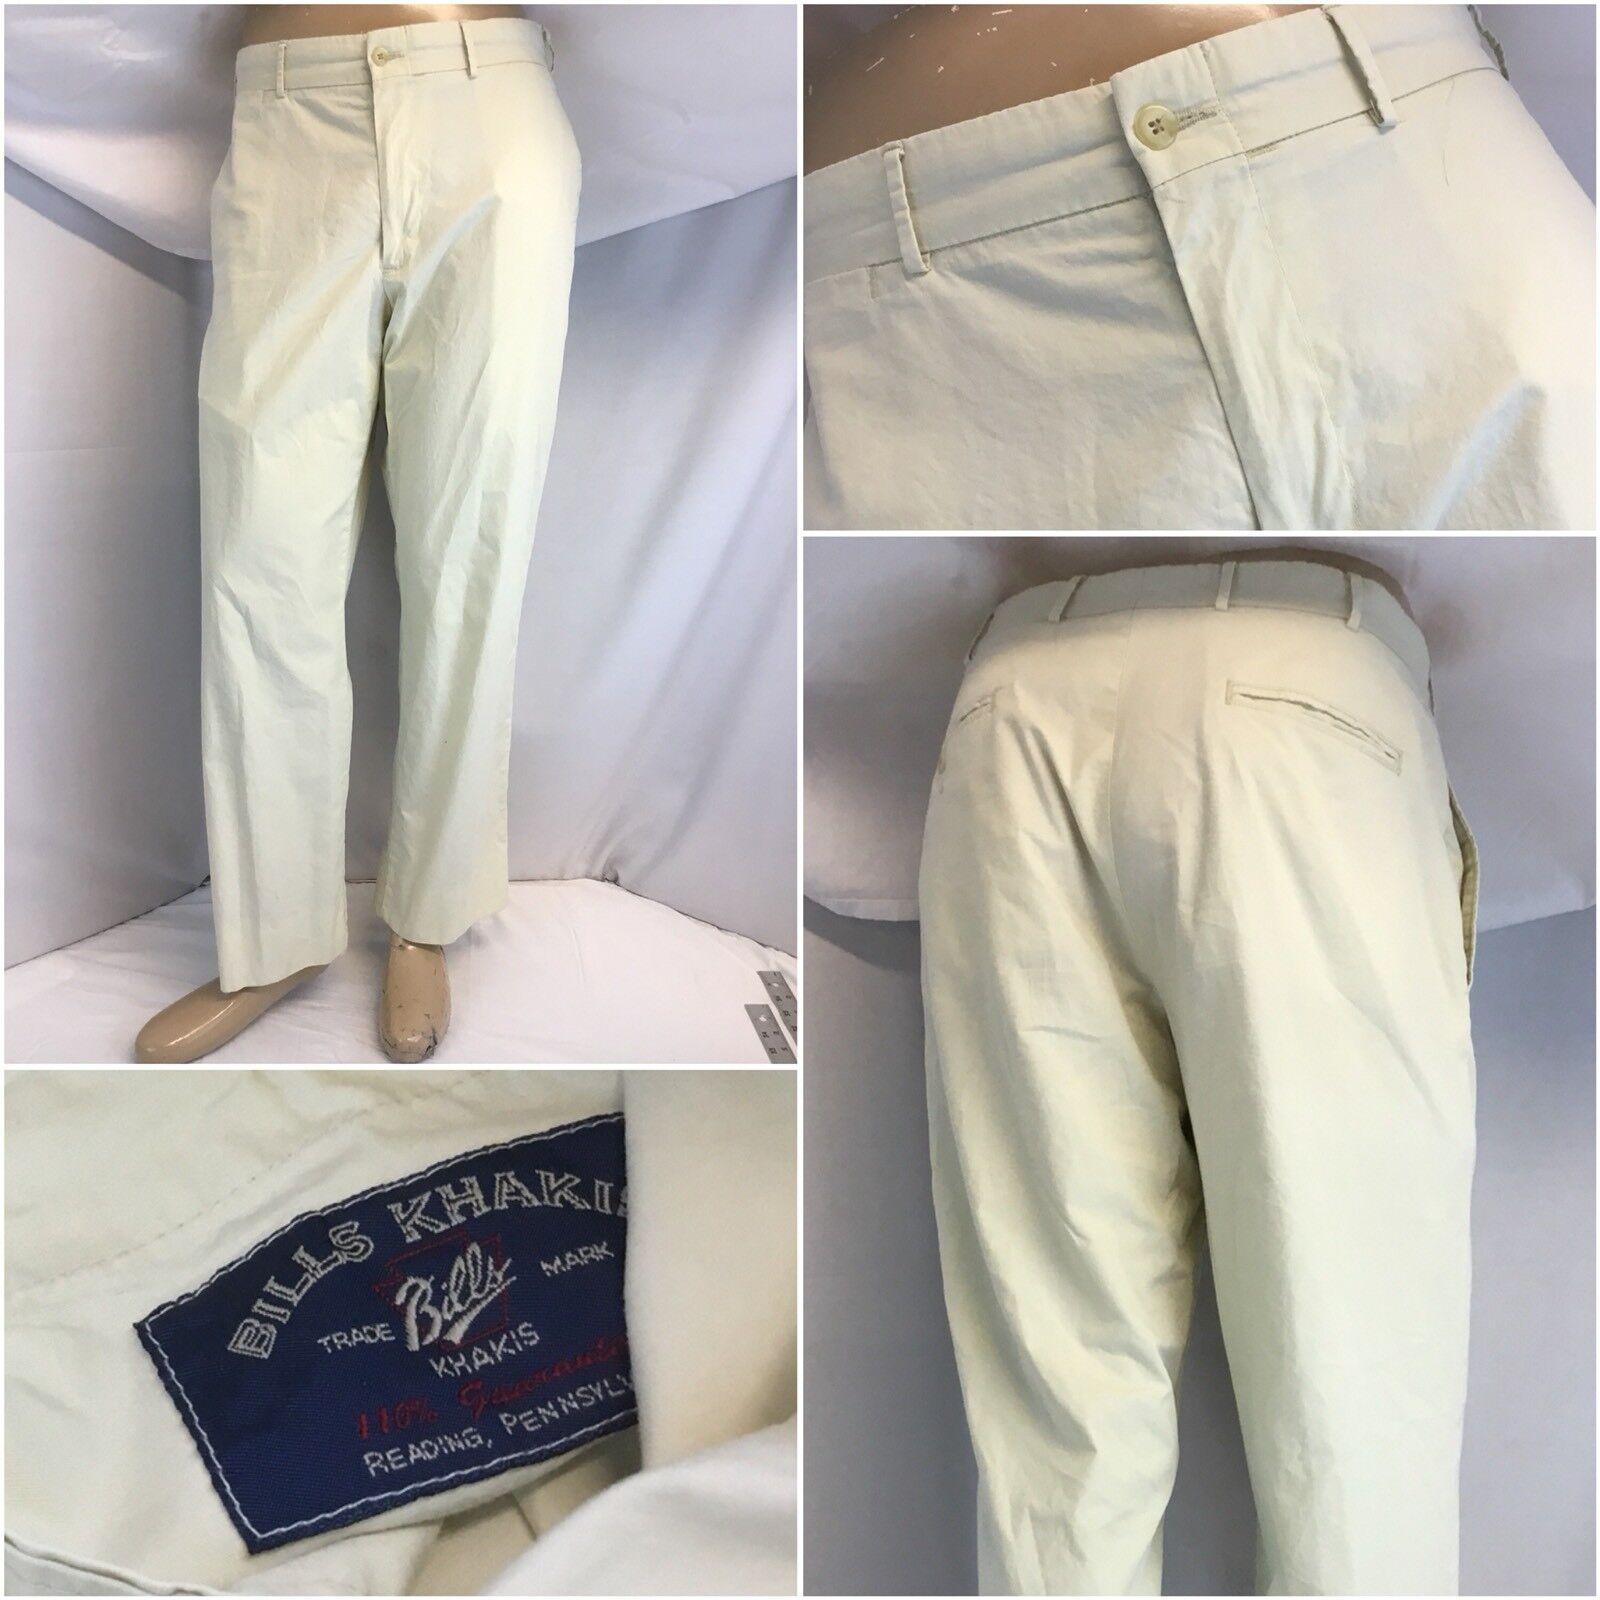 Bill's Khakis Pants 33x29 Beige 100% Cotton Flat Front M2 EUC YGI F8-574